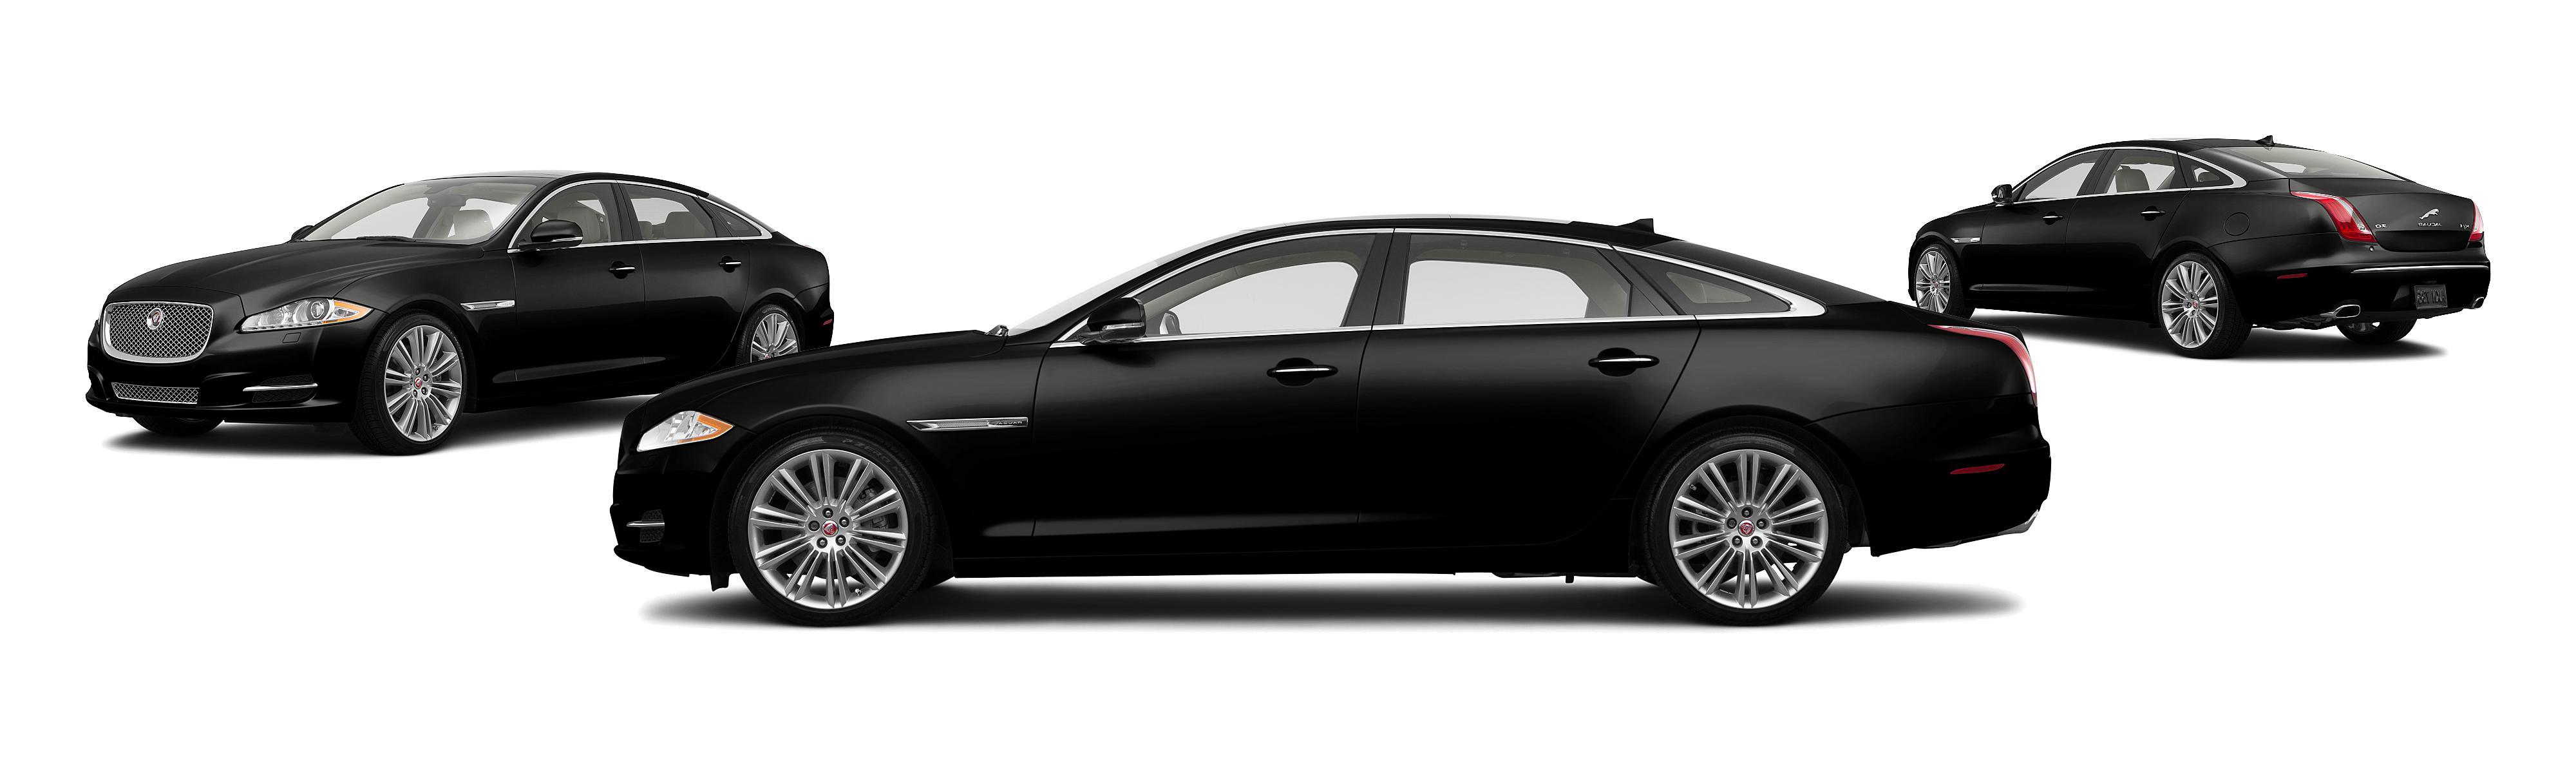 top car review front jaguar xf reviews gear